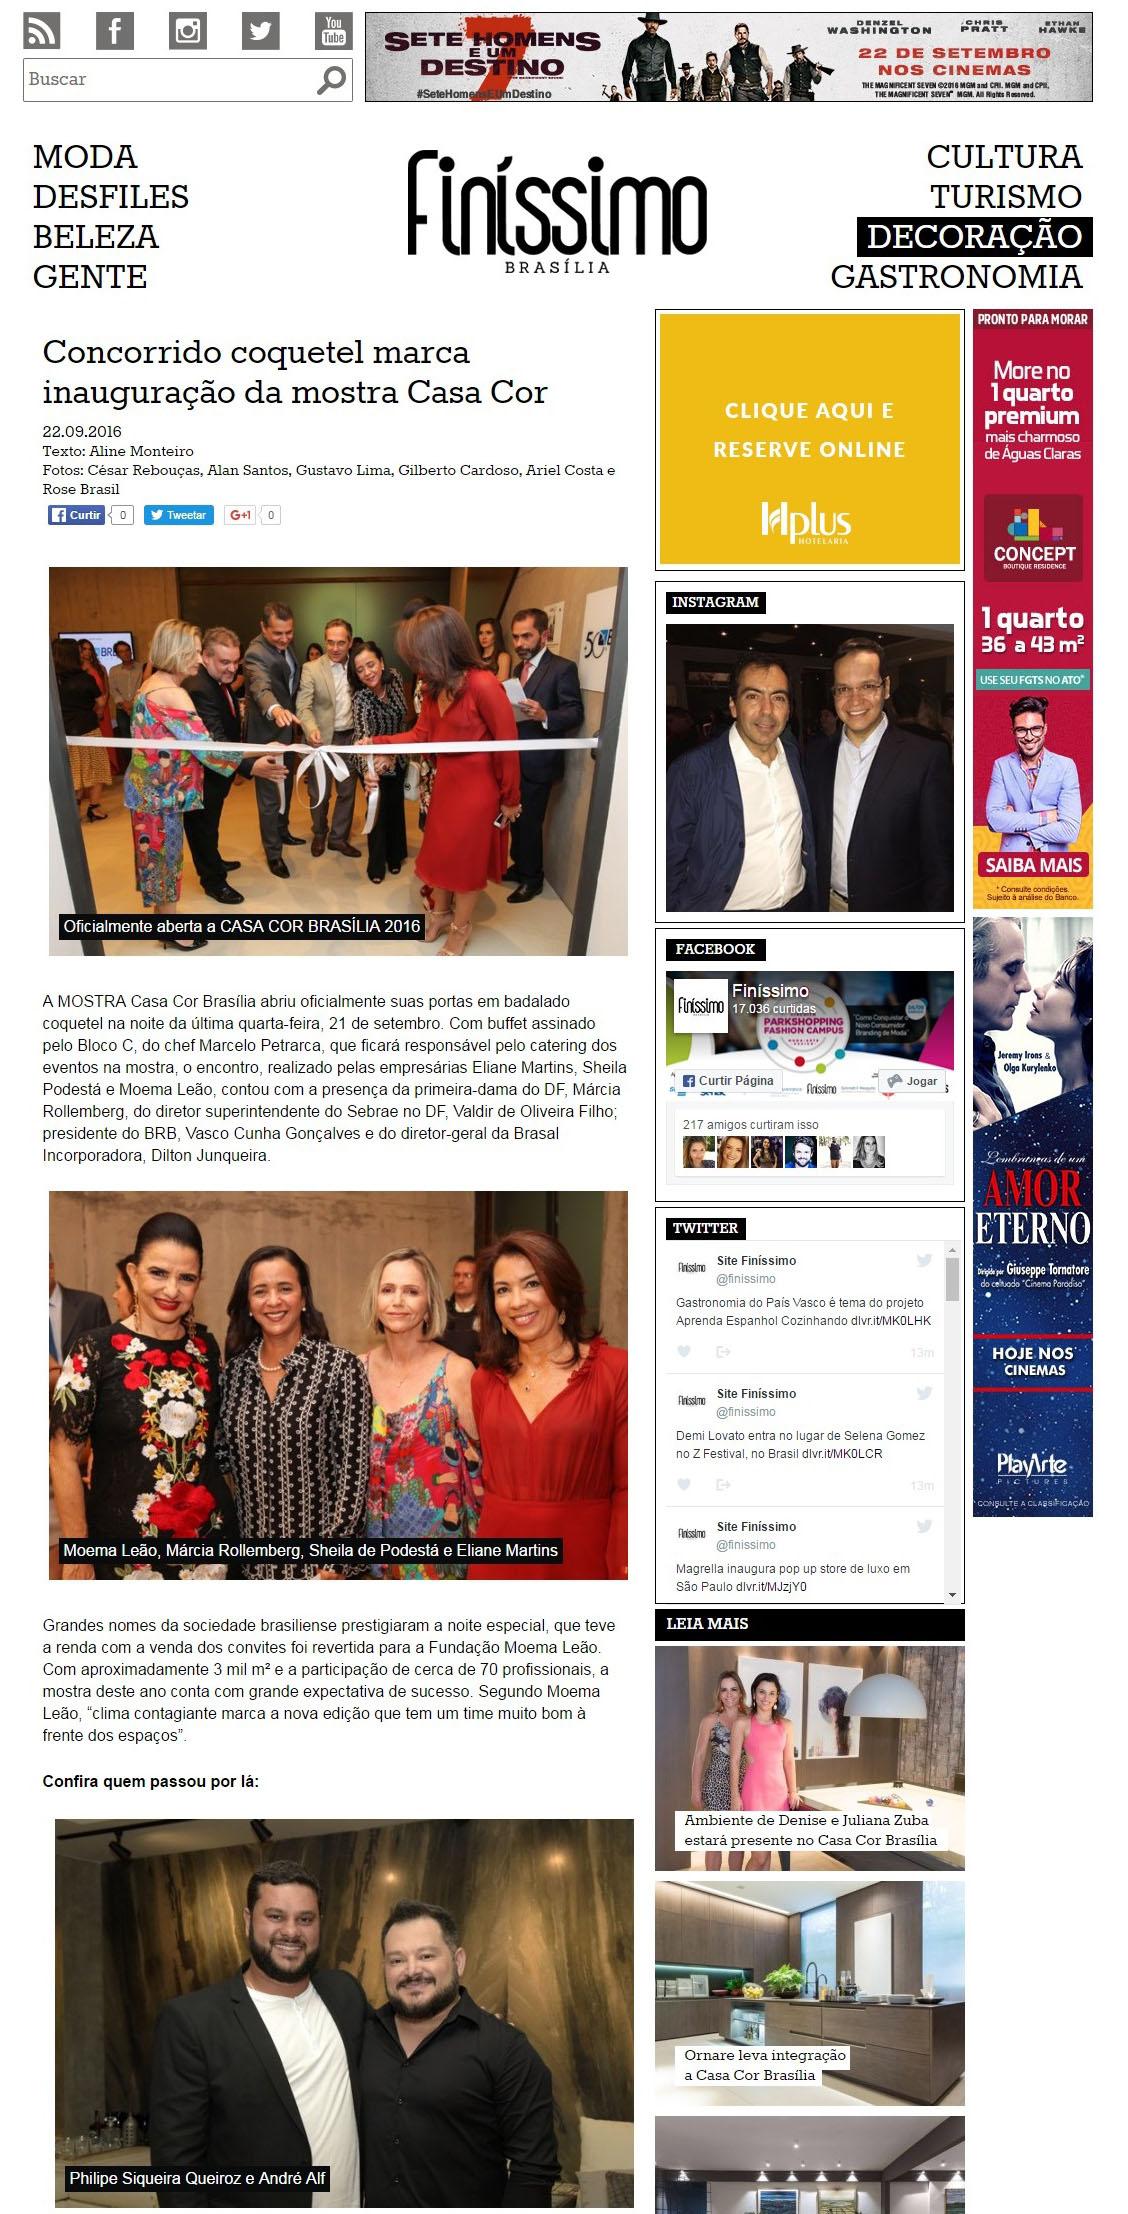 22_09_concorrido-coquetel-marca-inauguracao-d_-http___finissimo-com-br_2016_09_22_c